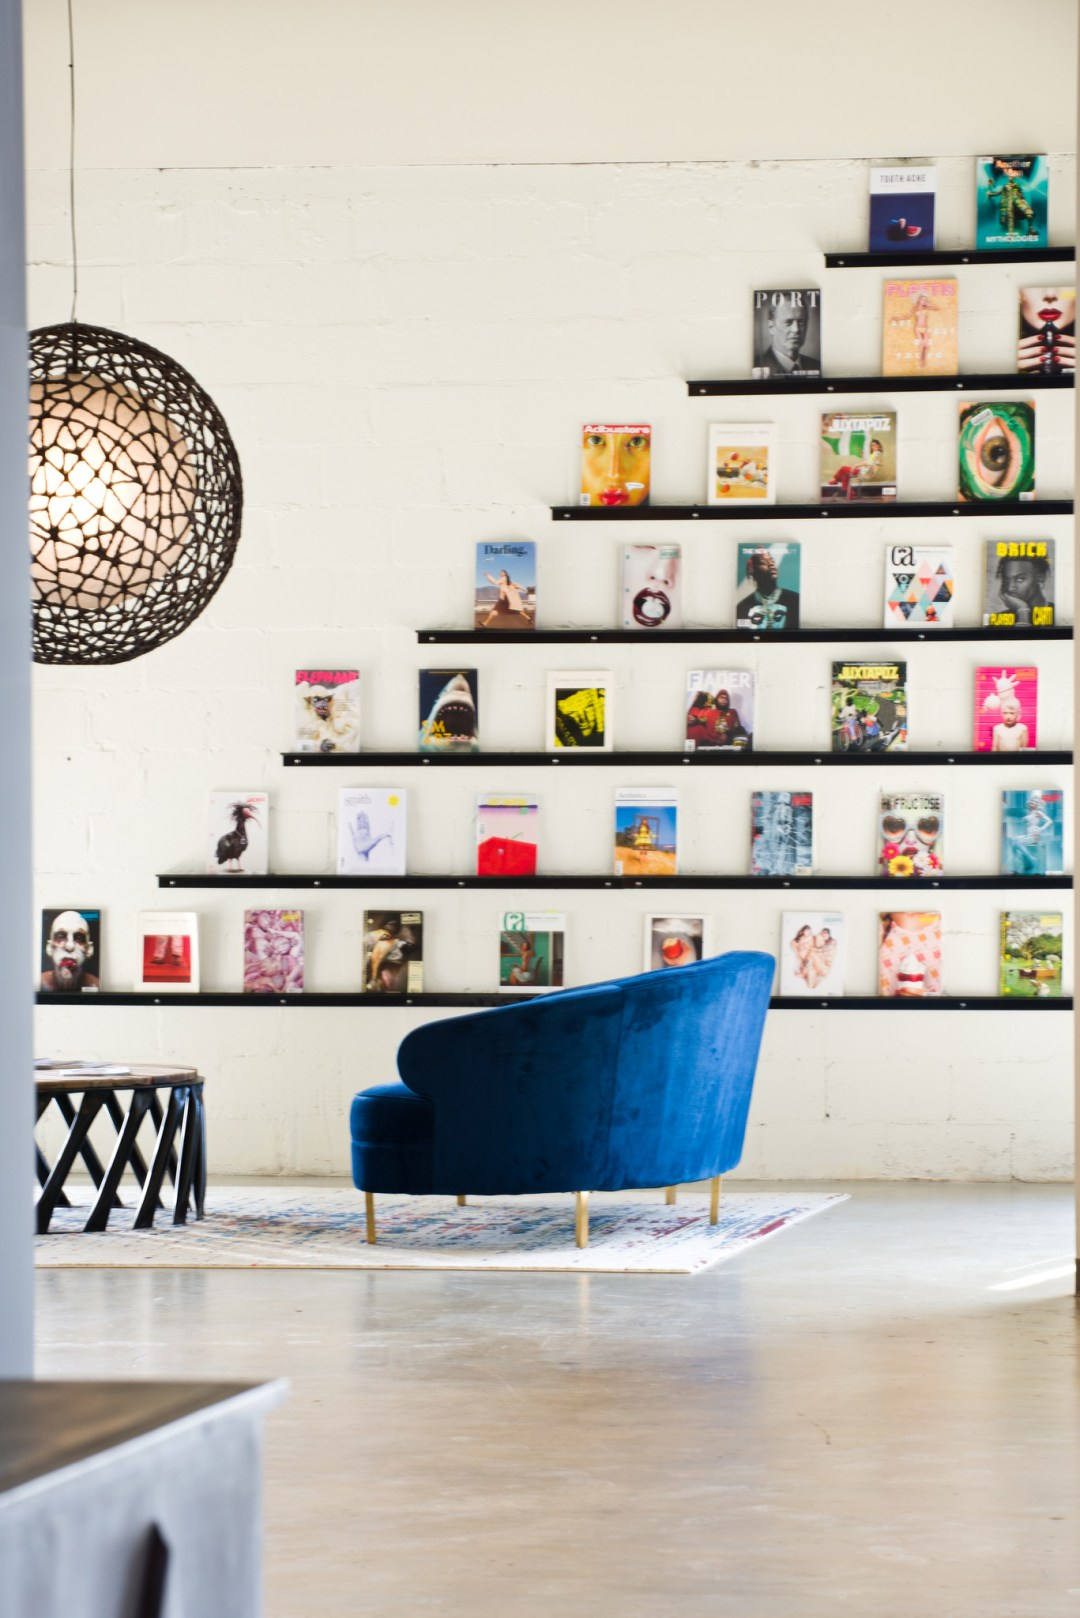 jesse-spade-atlanta-custom-fabrication-magazine-display-wall-shelves